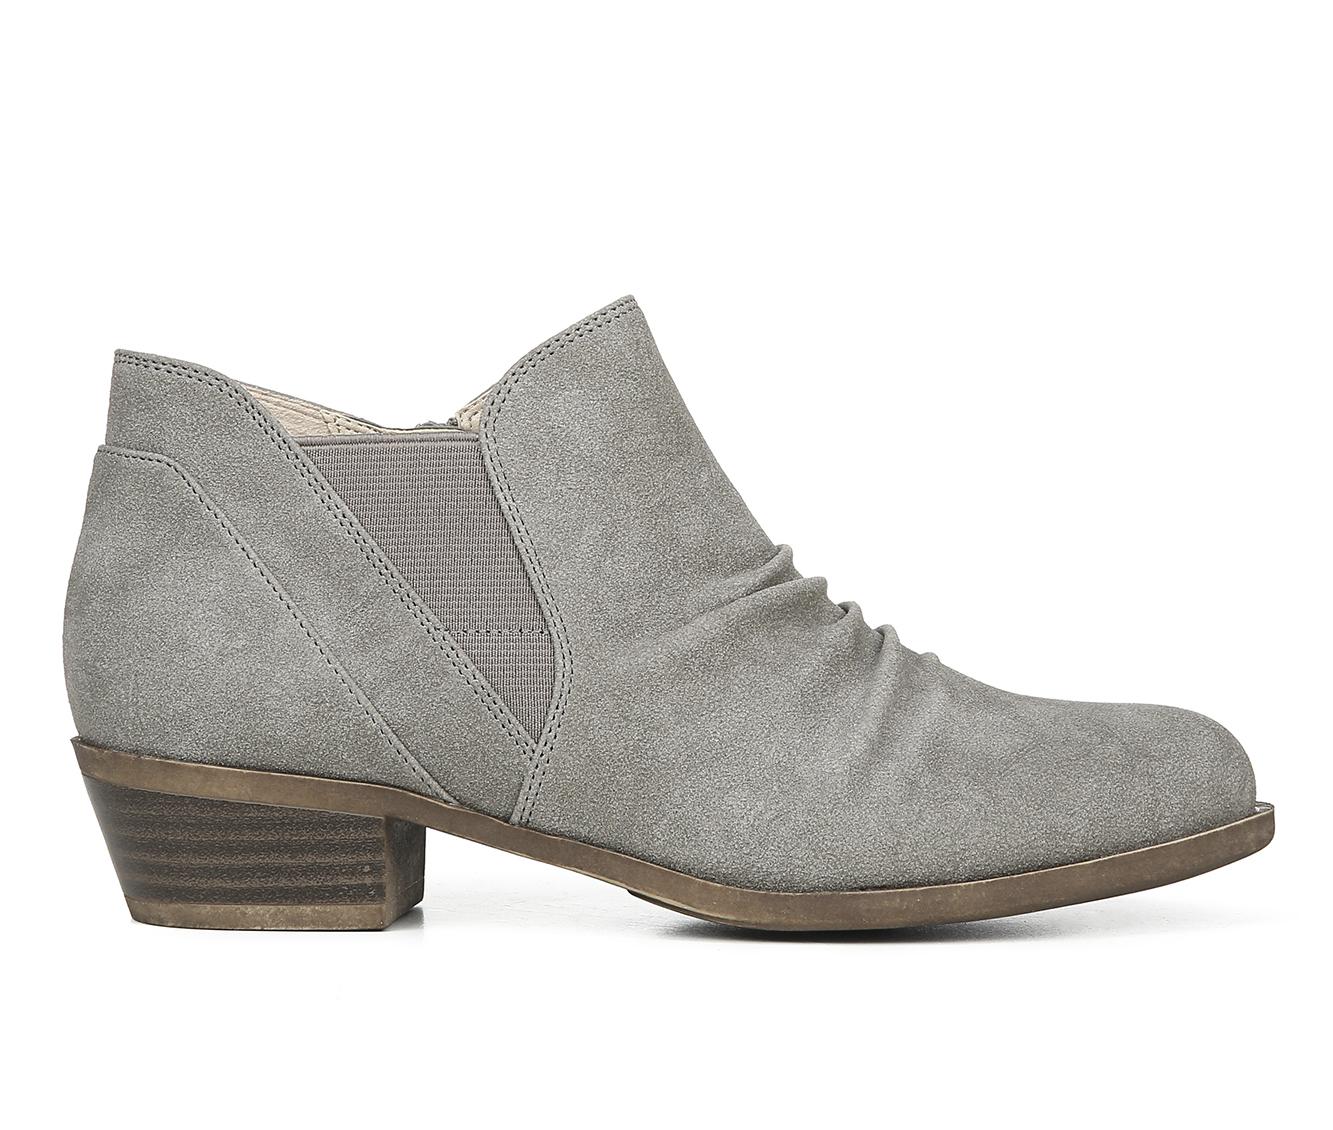 LifeStride Aurora Women's Boots (Gray - Faux Leather)